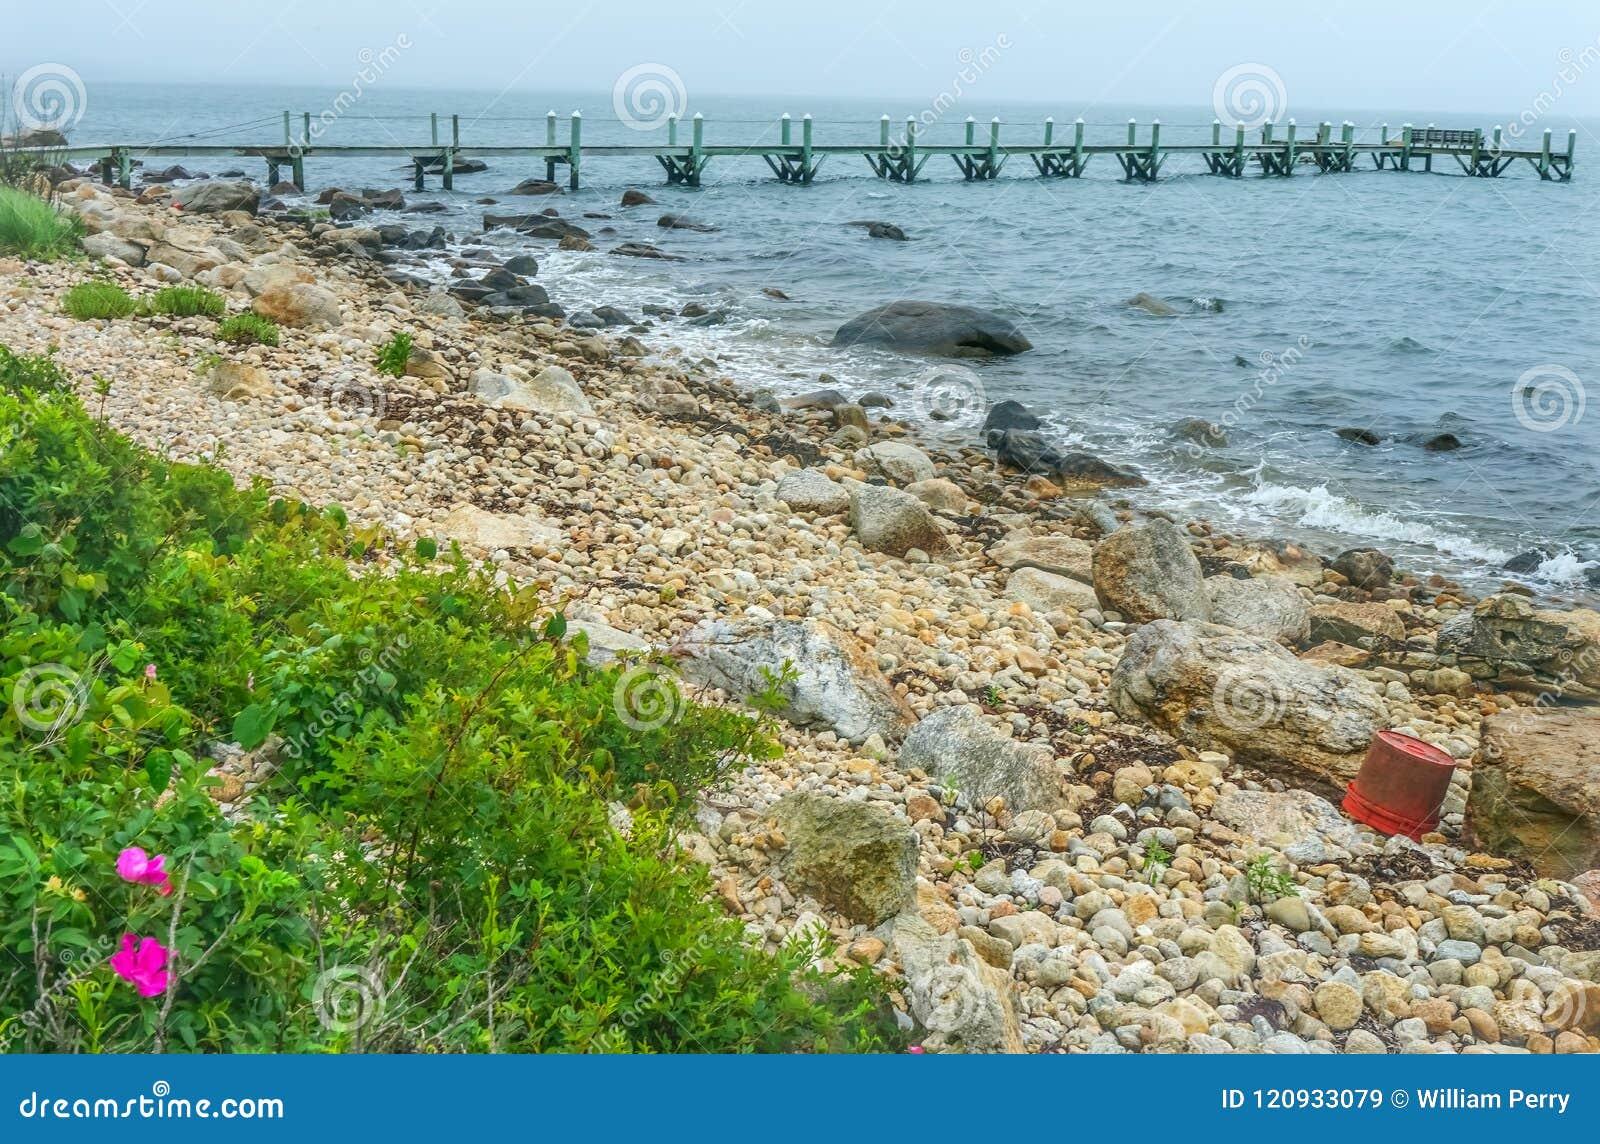 Spiaggia pietrosa Pier Piink Roses Padnaram Dartmouth mA di mattina nebbiosa